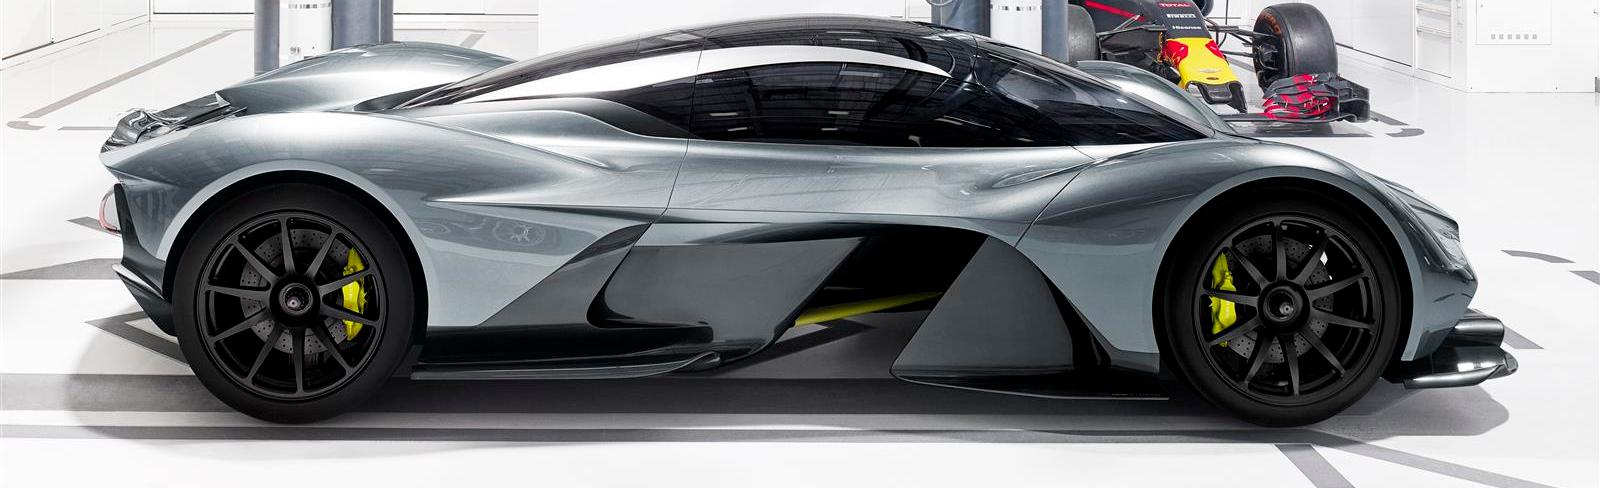 Aston Martin AM-RB-001